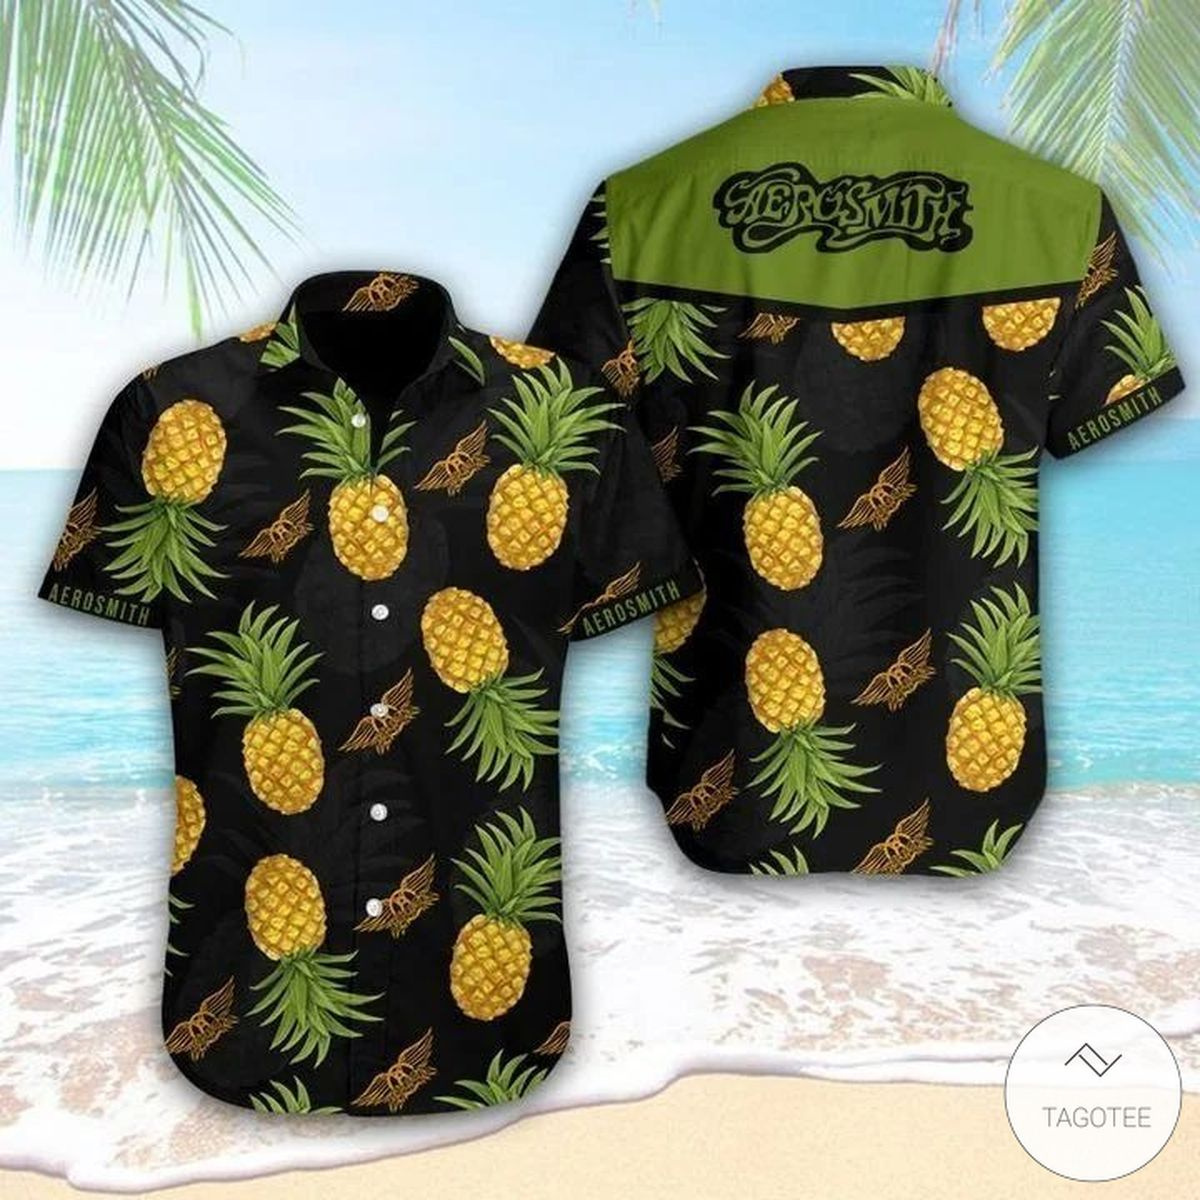 Aerosmith Pineapple Hawaiian Shirt